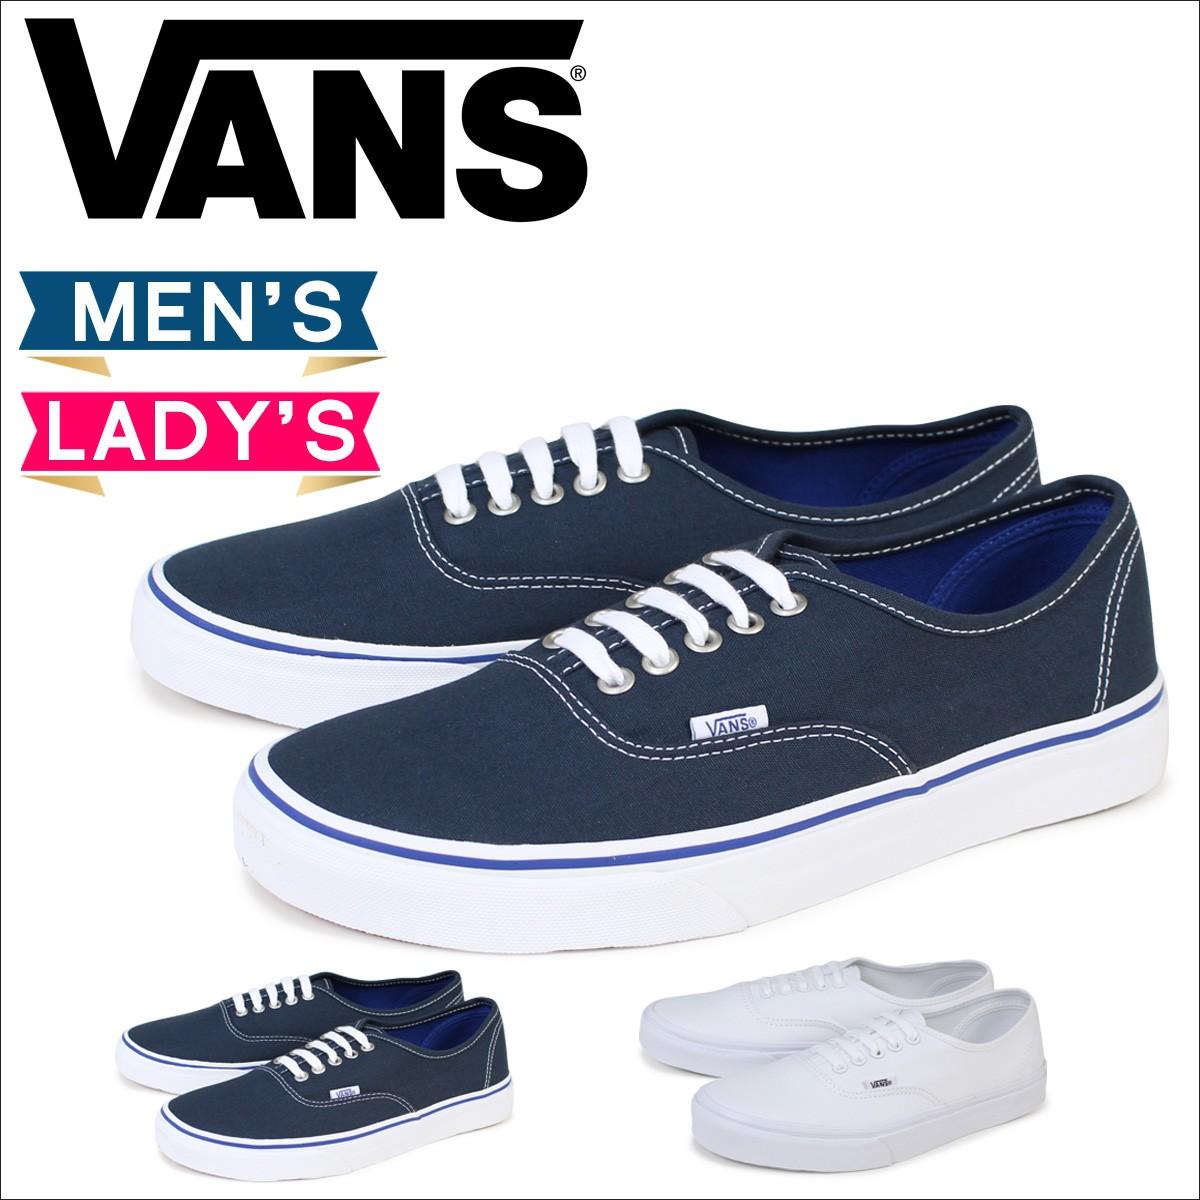 VANS オーセンティック スニーカー メンズ レディース バンズ ヴァンズ AUTHENTIC VN000EE3W00 VN0004MLJPV 靴 ホワイト ネイビー